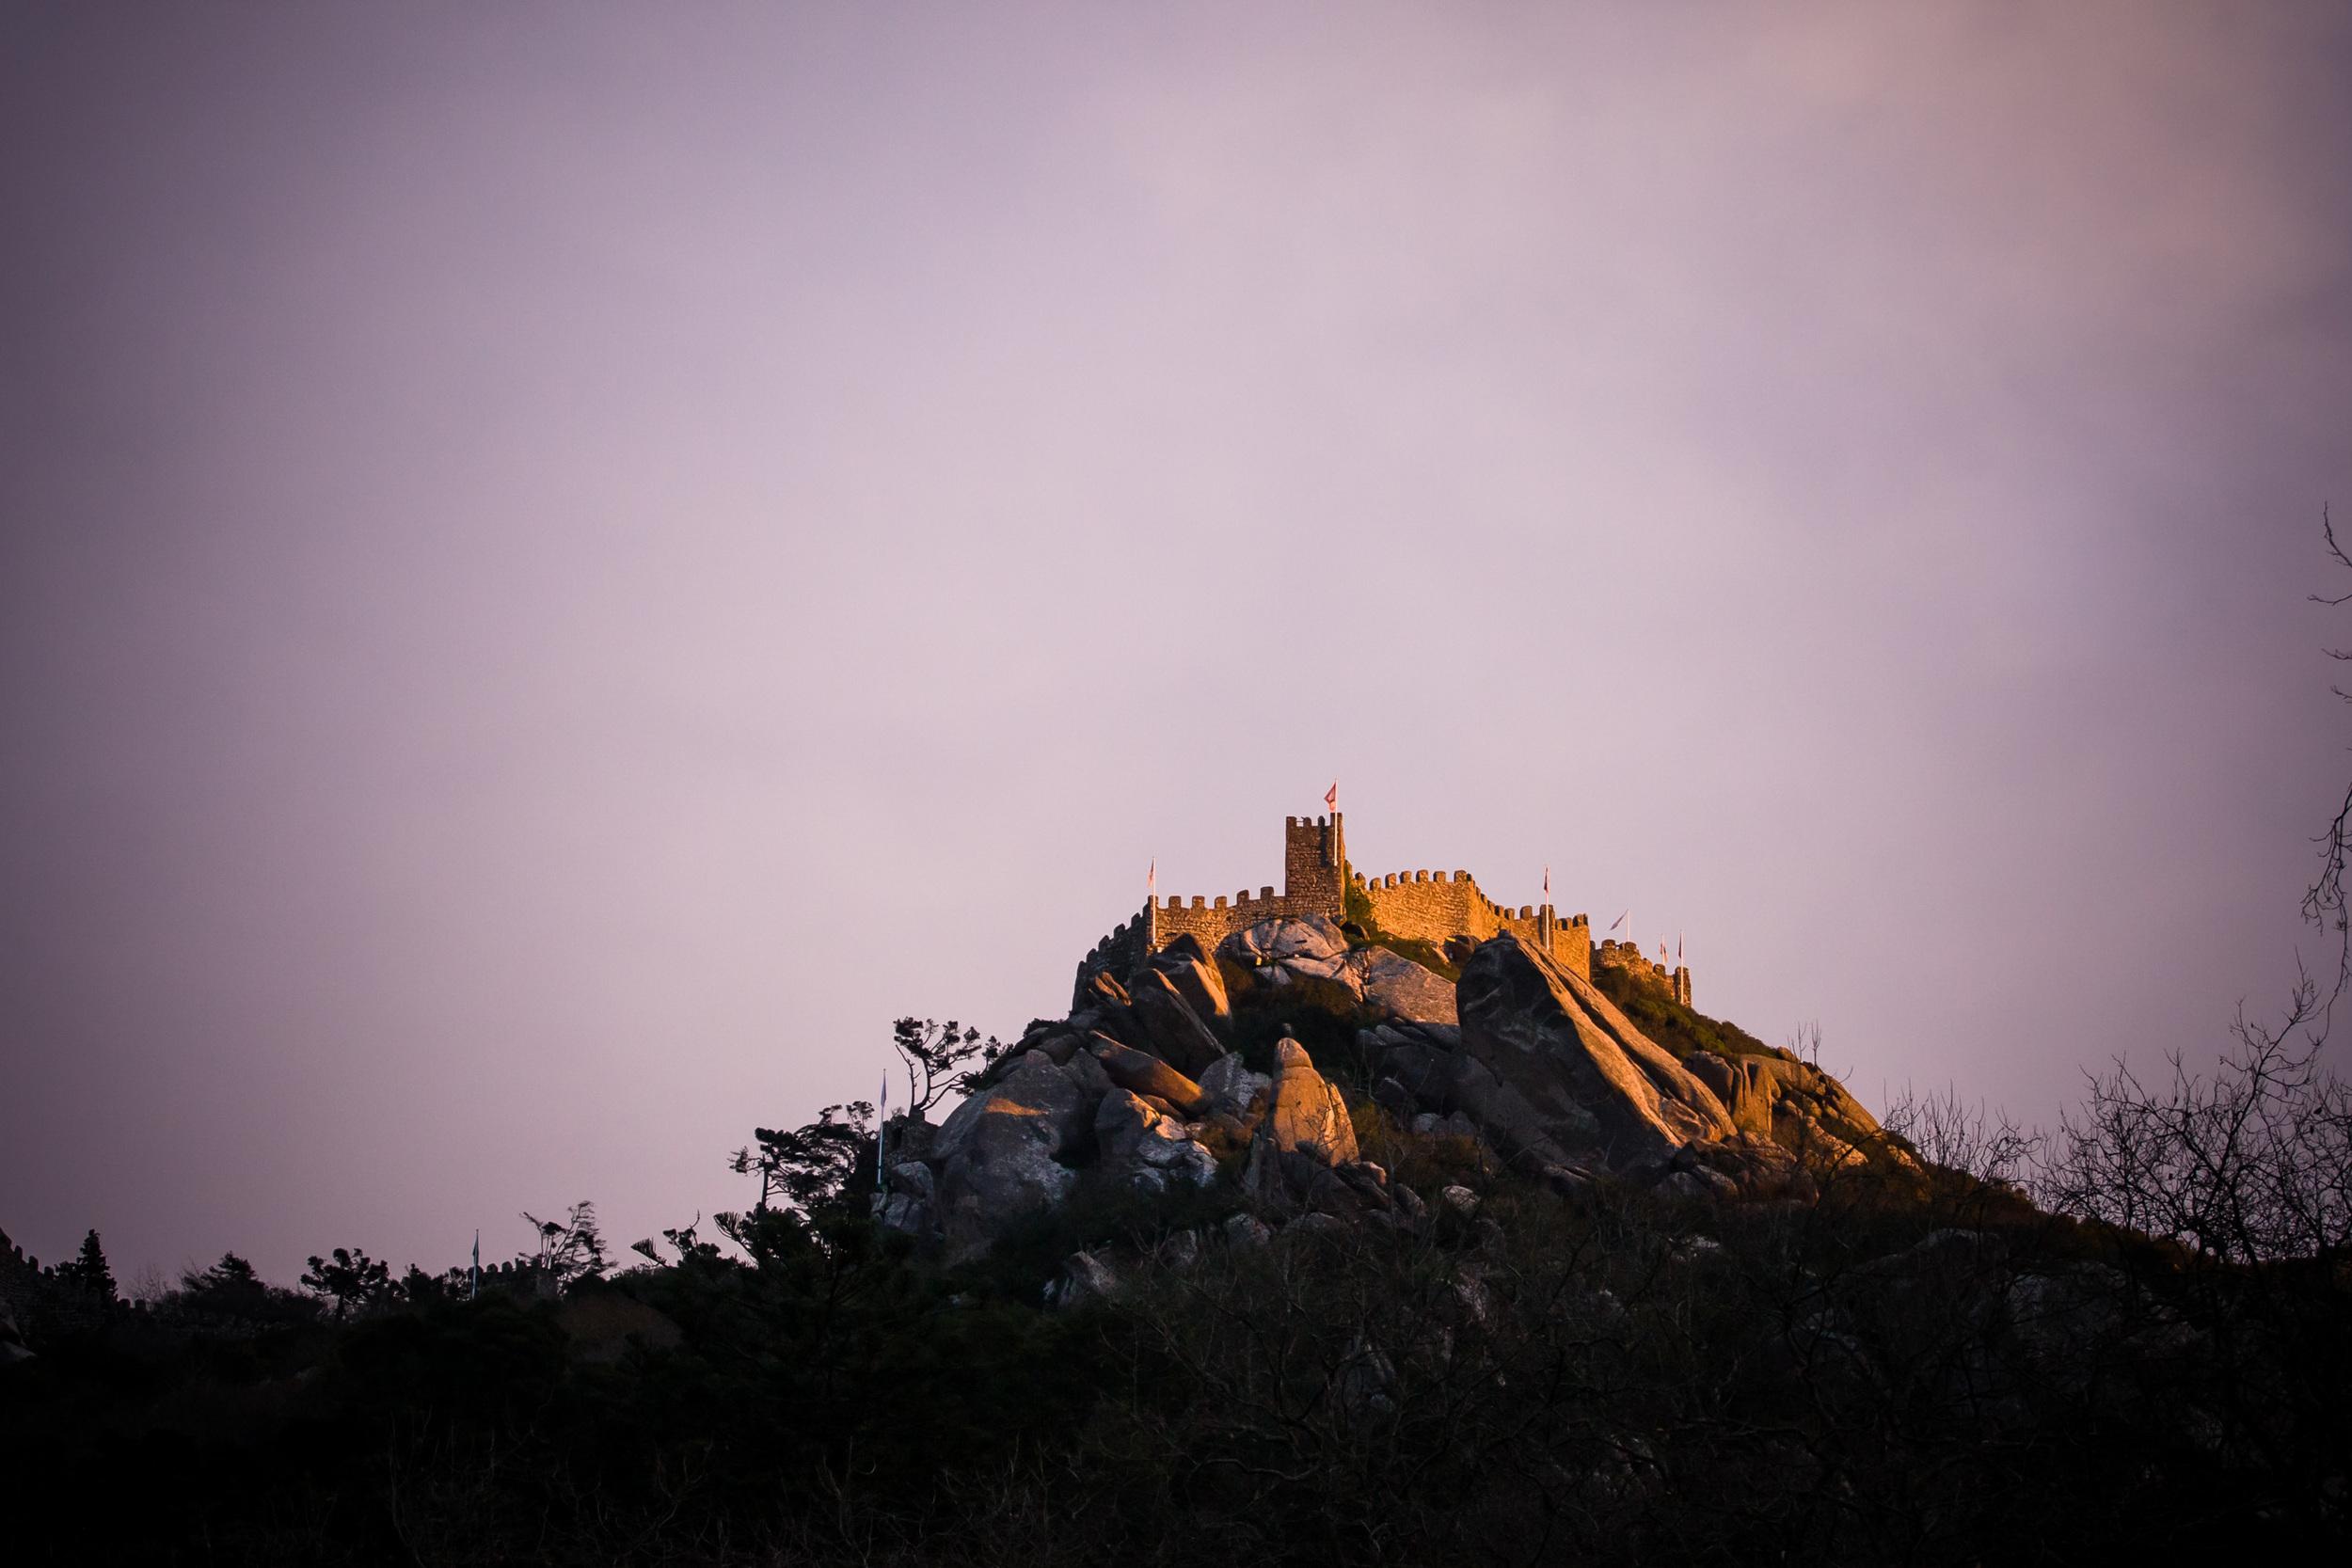 Castelo dos Mouros in the winter's evening light.